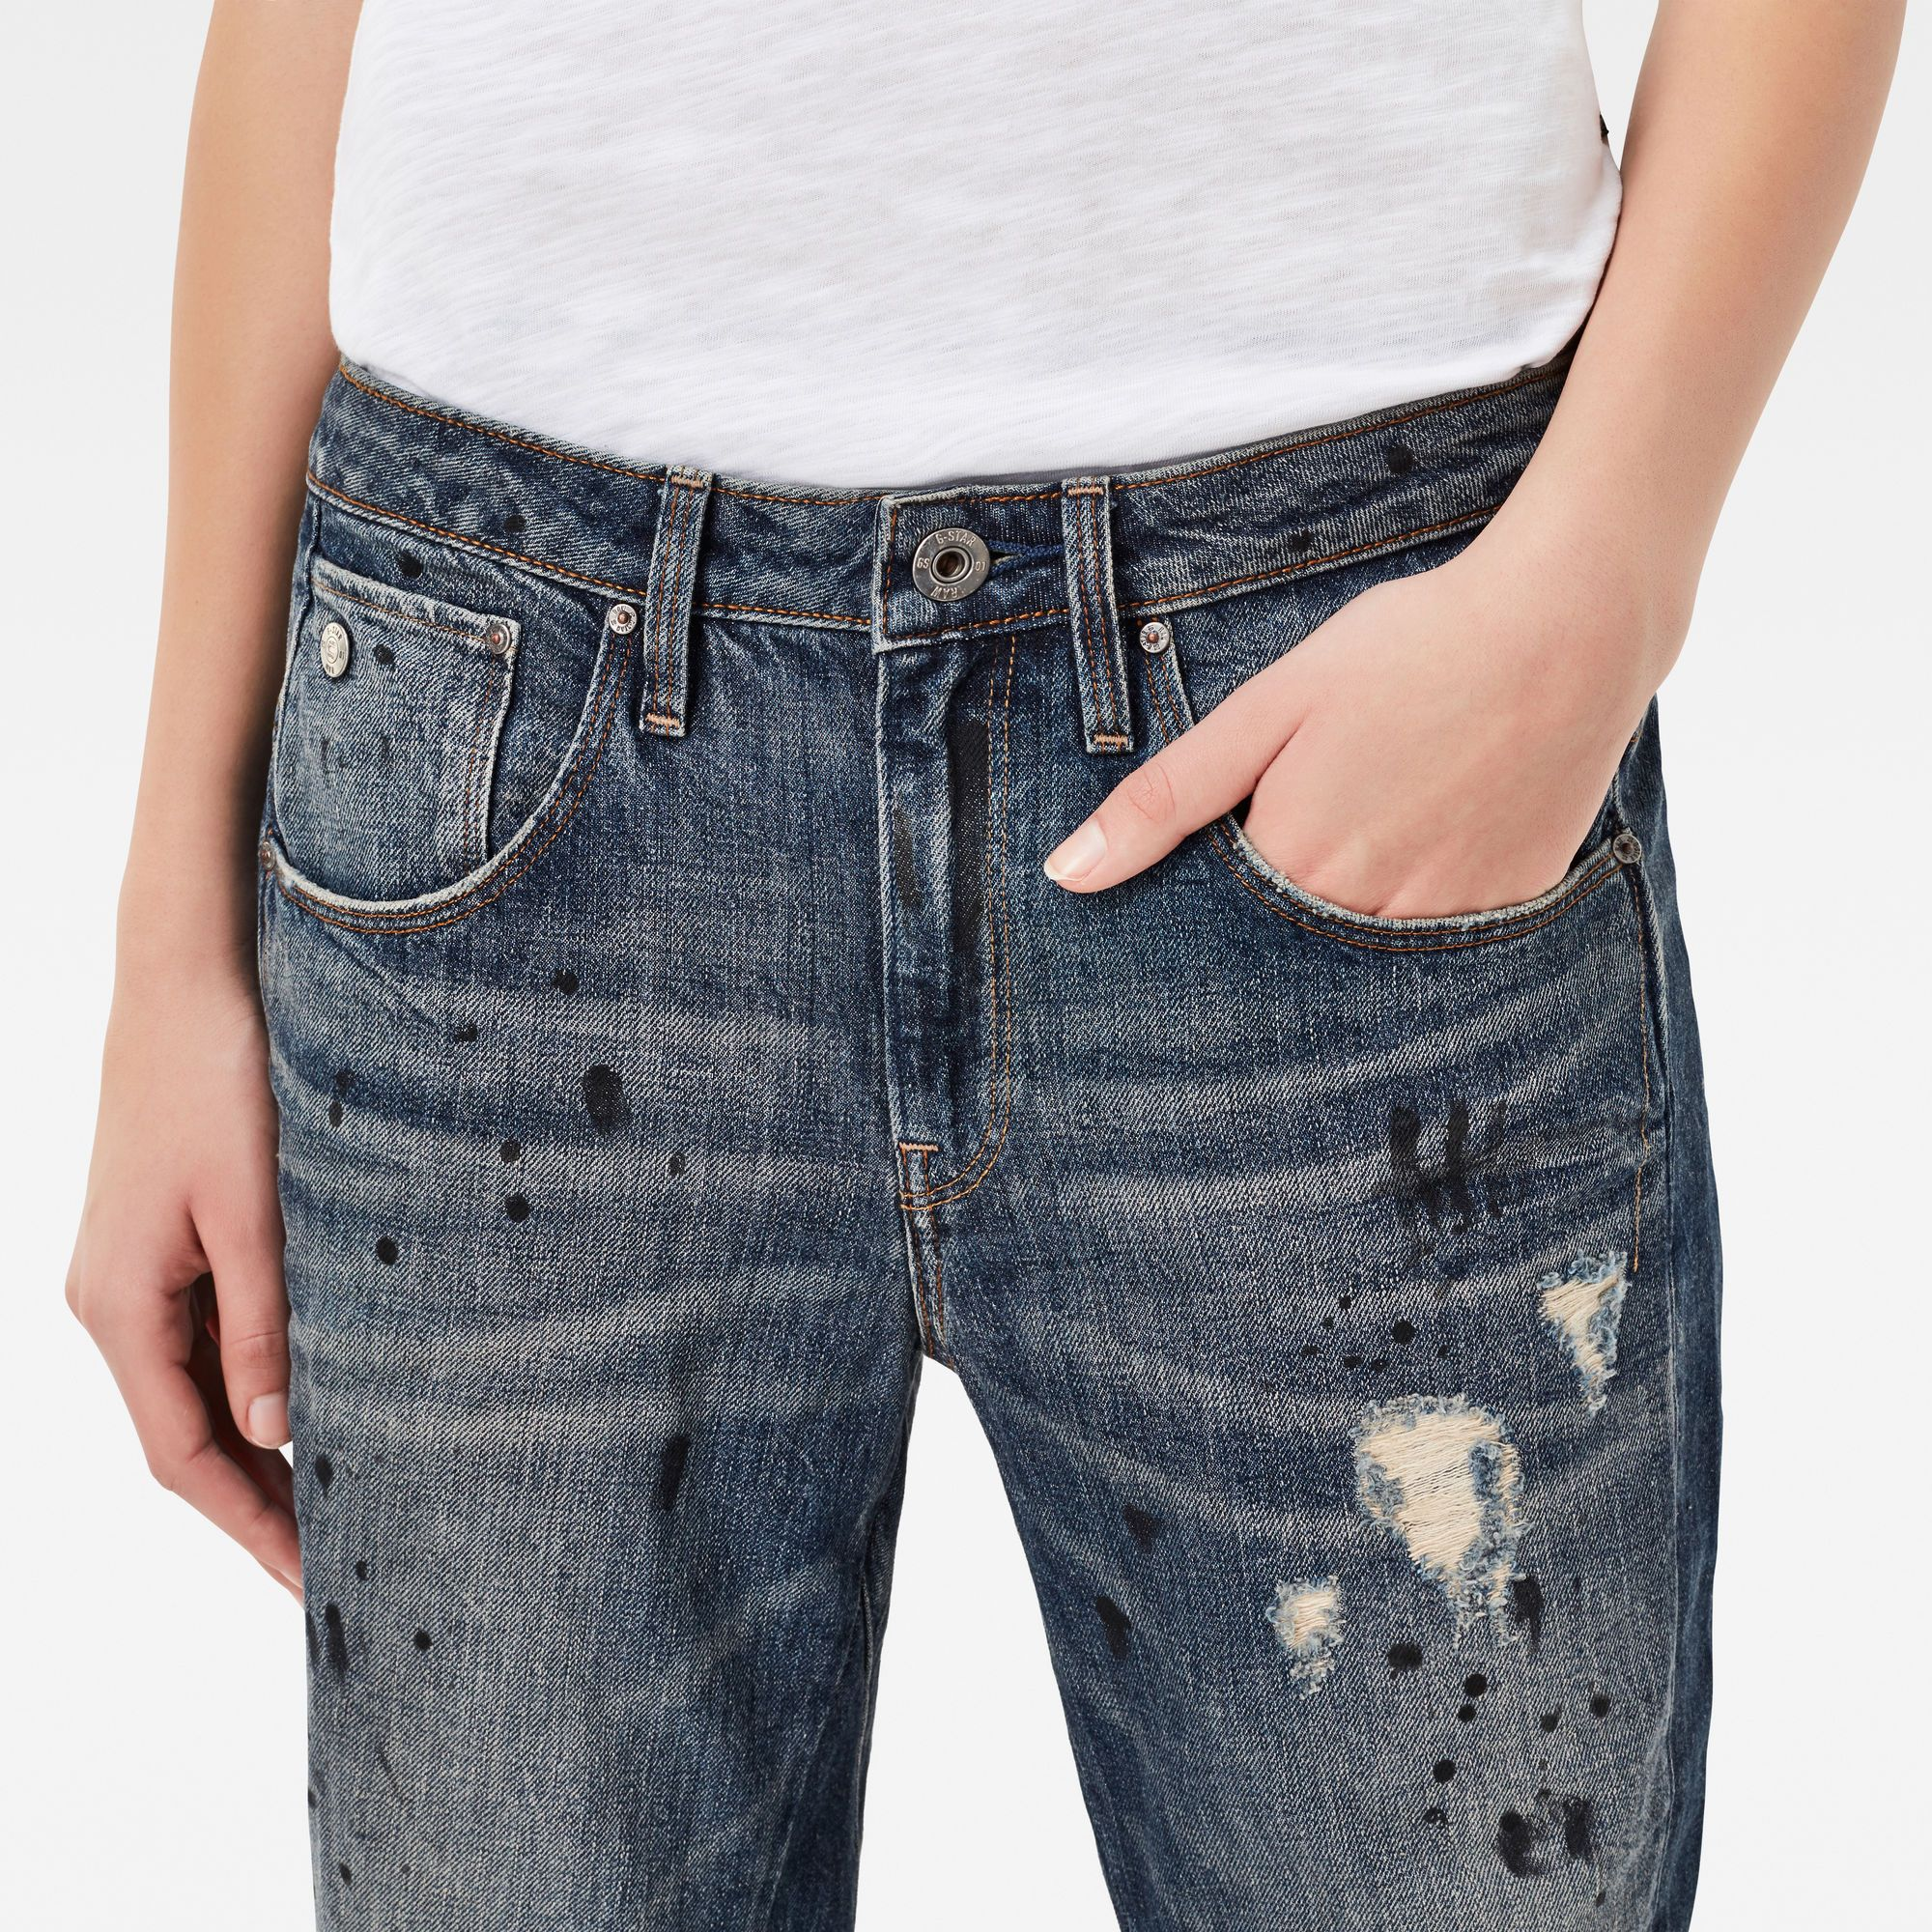 G-Star RAW Arc 3D Low Waist Boyfriend 7/8 Length Jeans